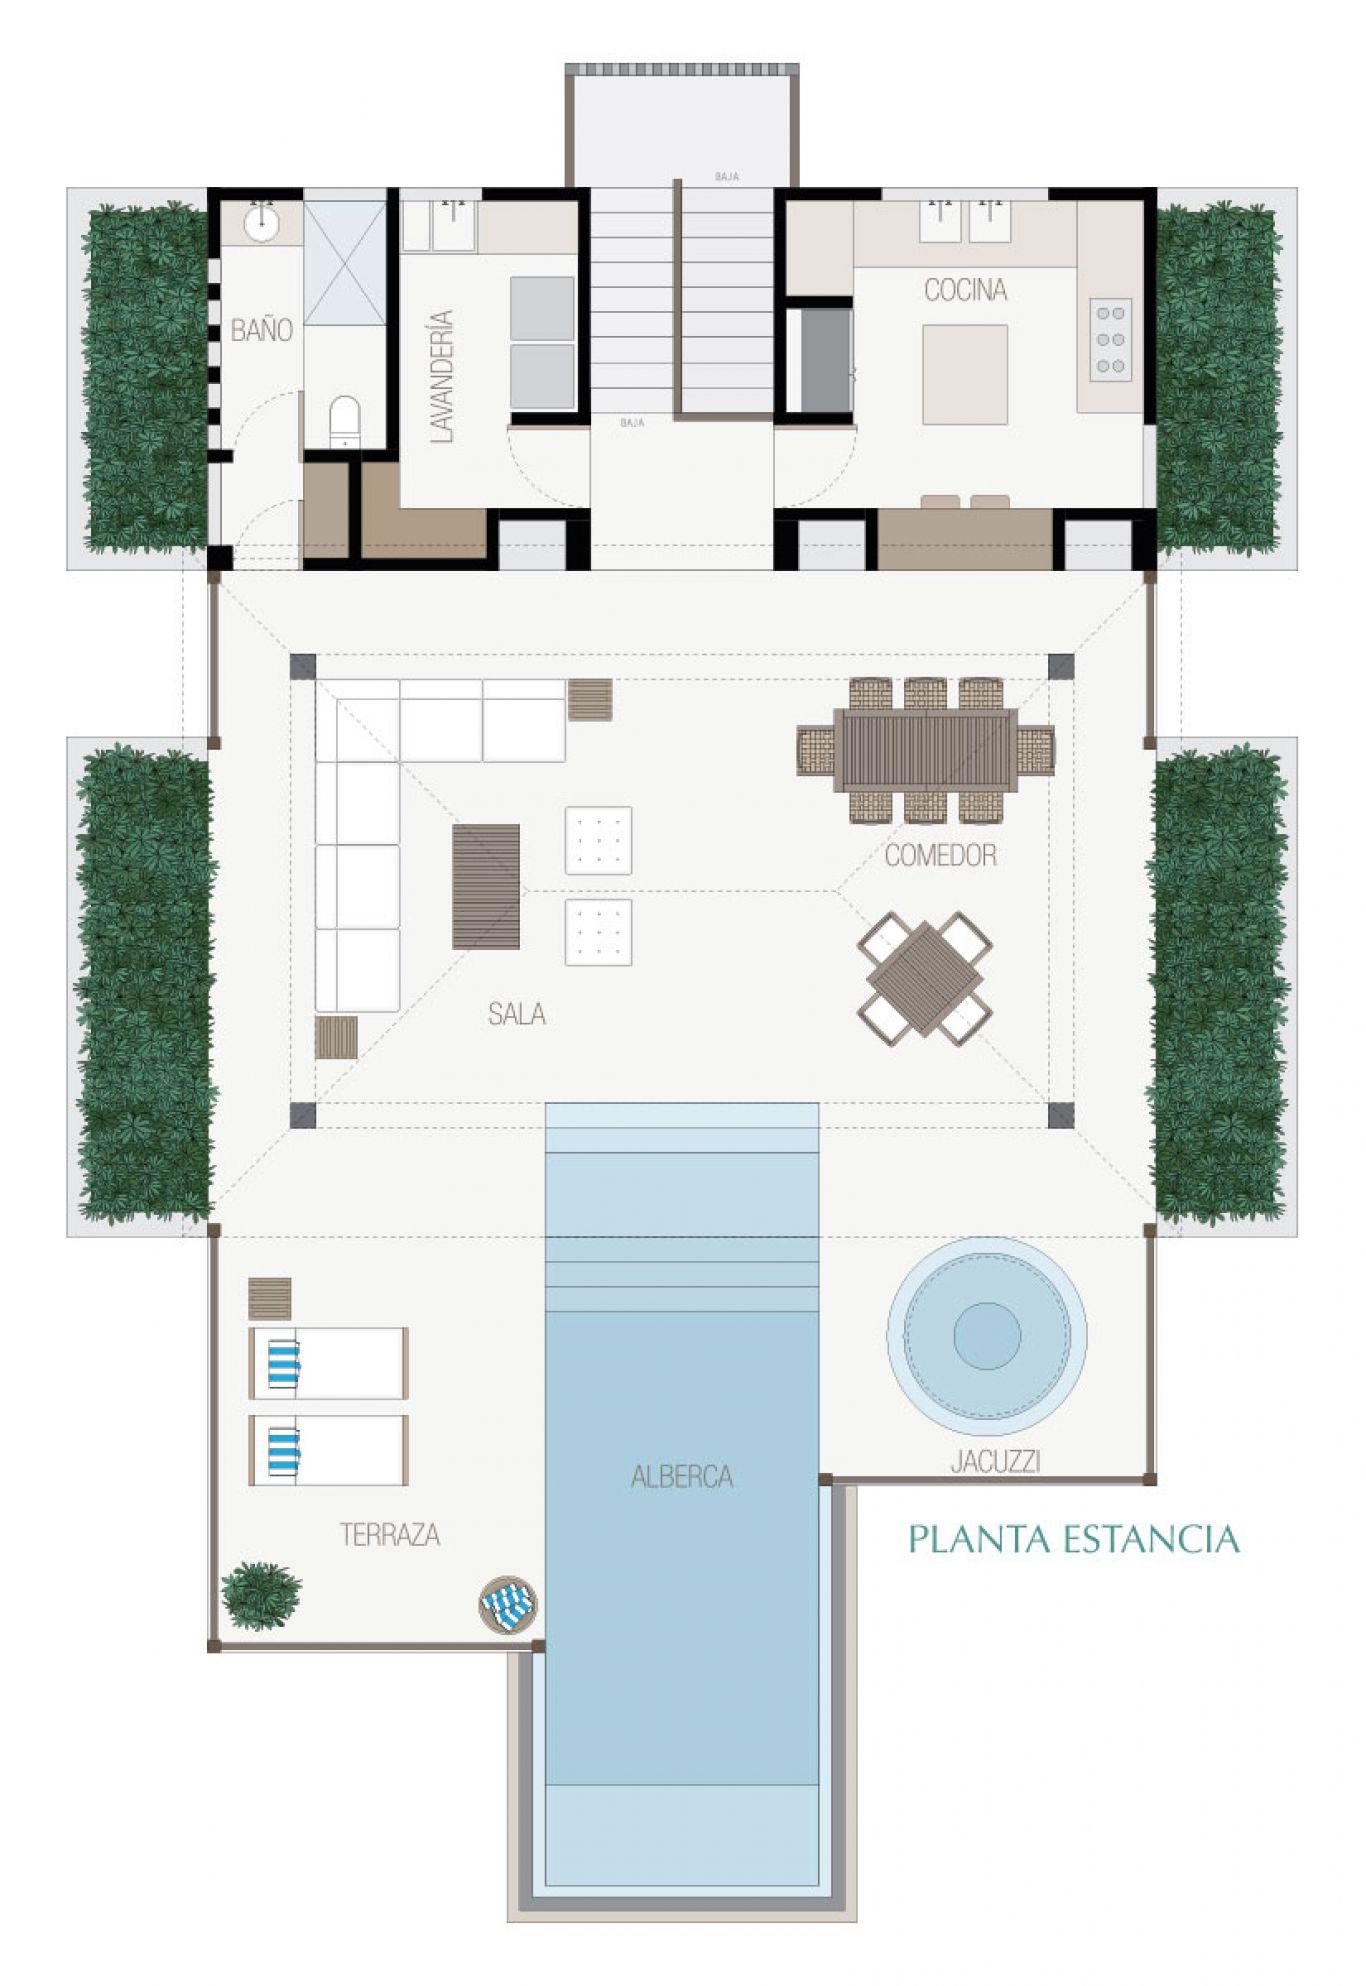 Manai, id 1519068, no 4, plano de villa 5, 294